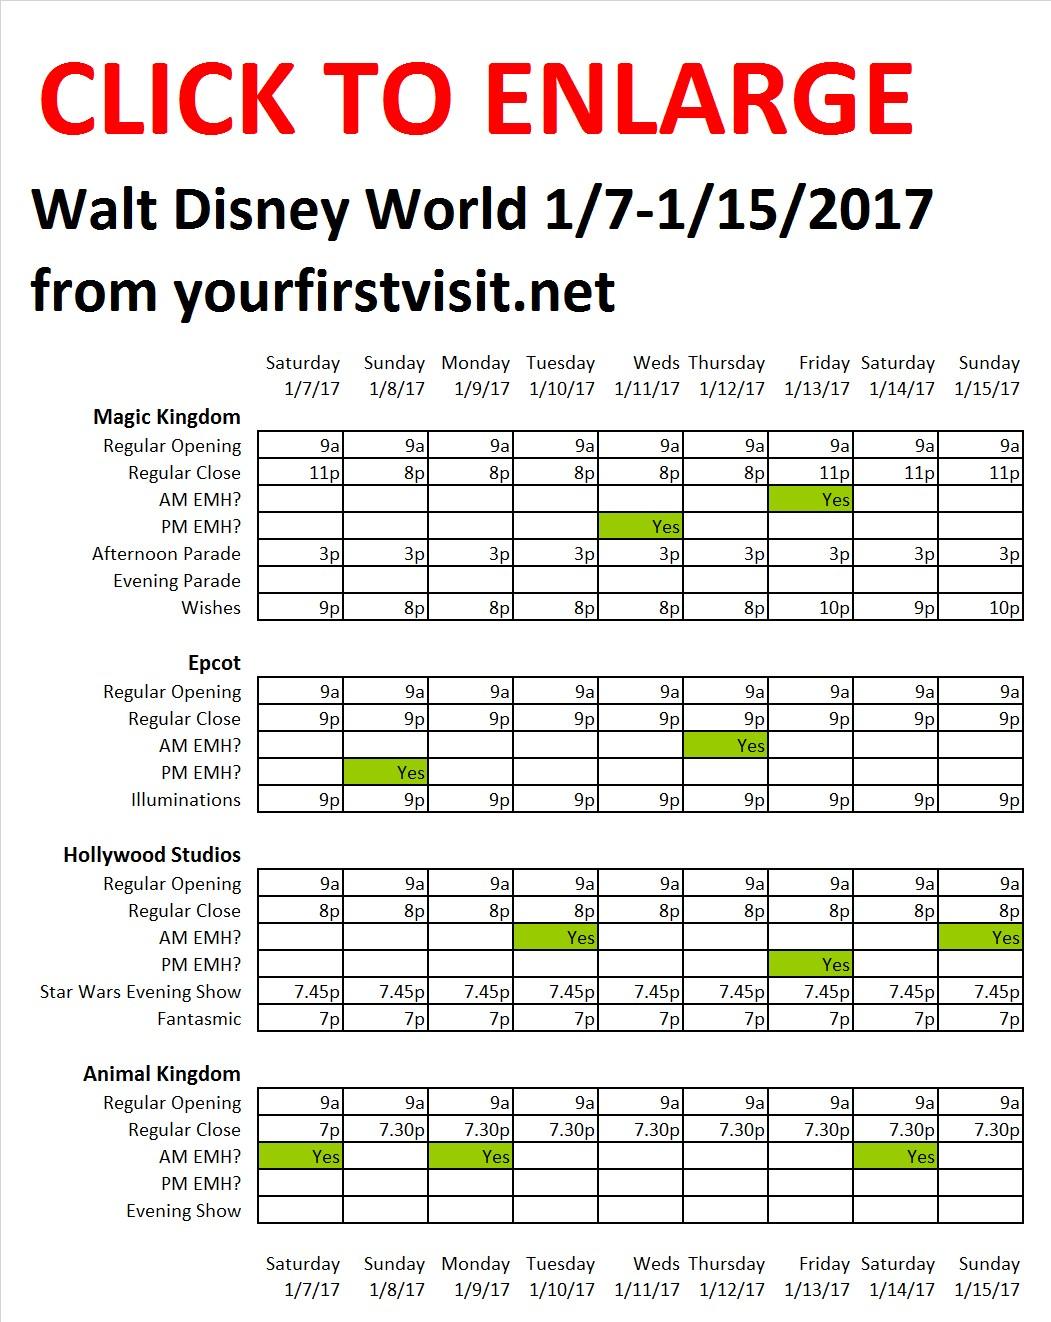 disney-world-1-7-to-1-15-2017-from-yourfirstvisit-net